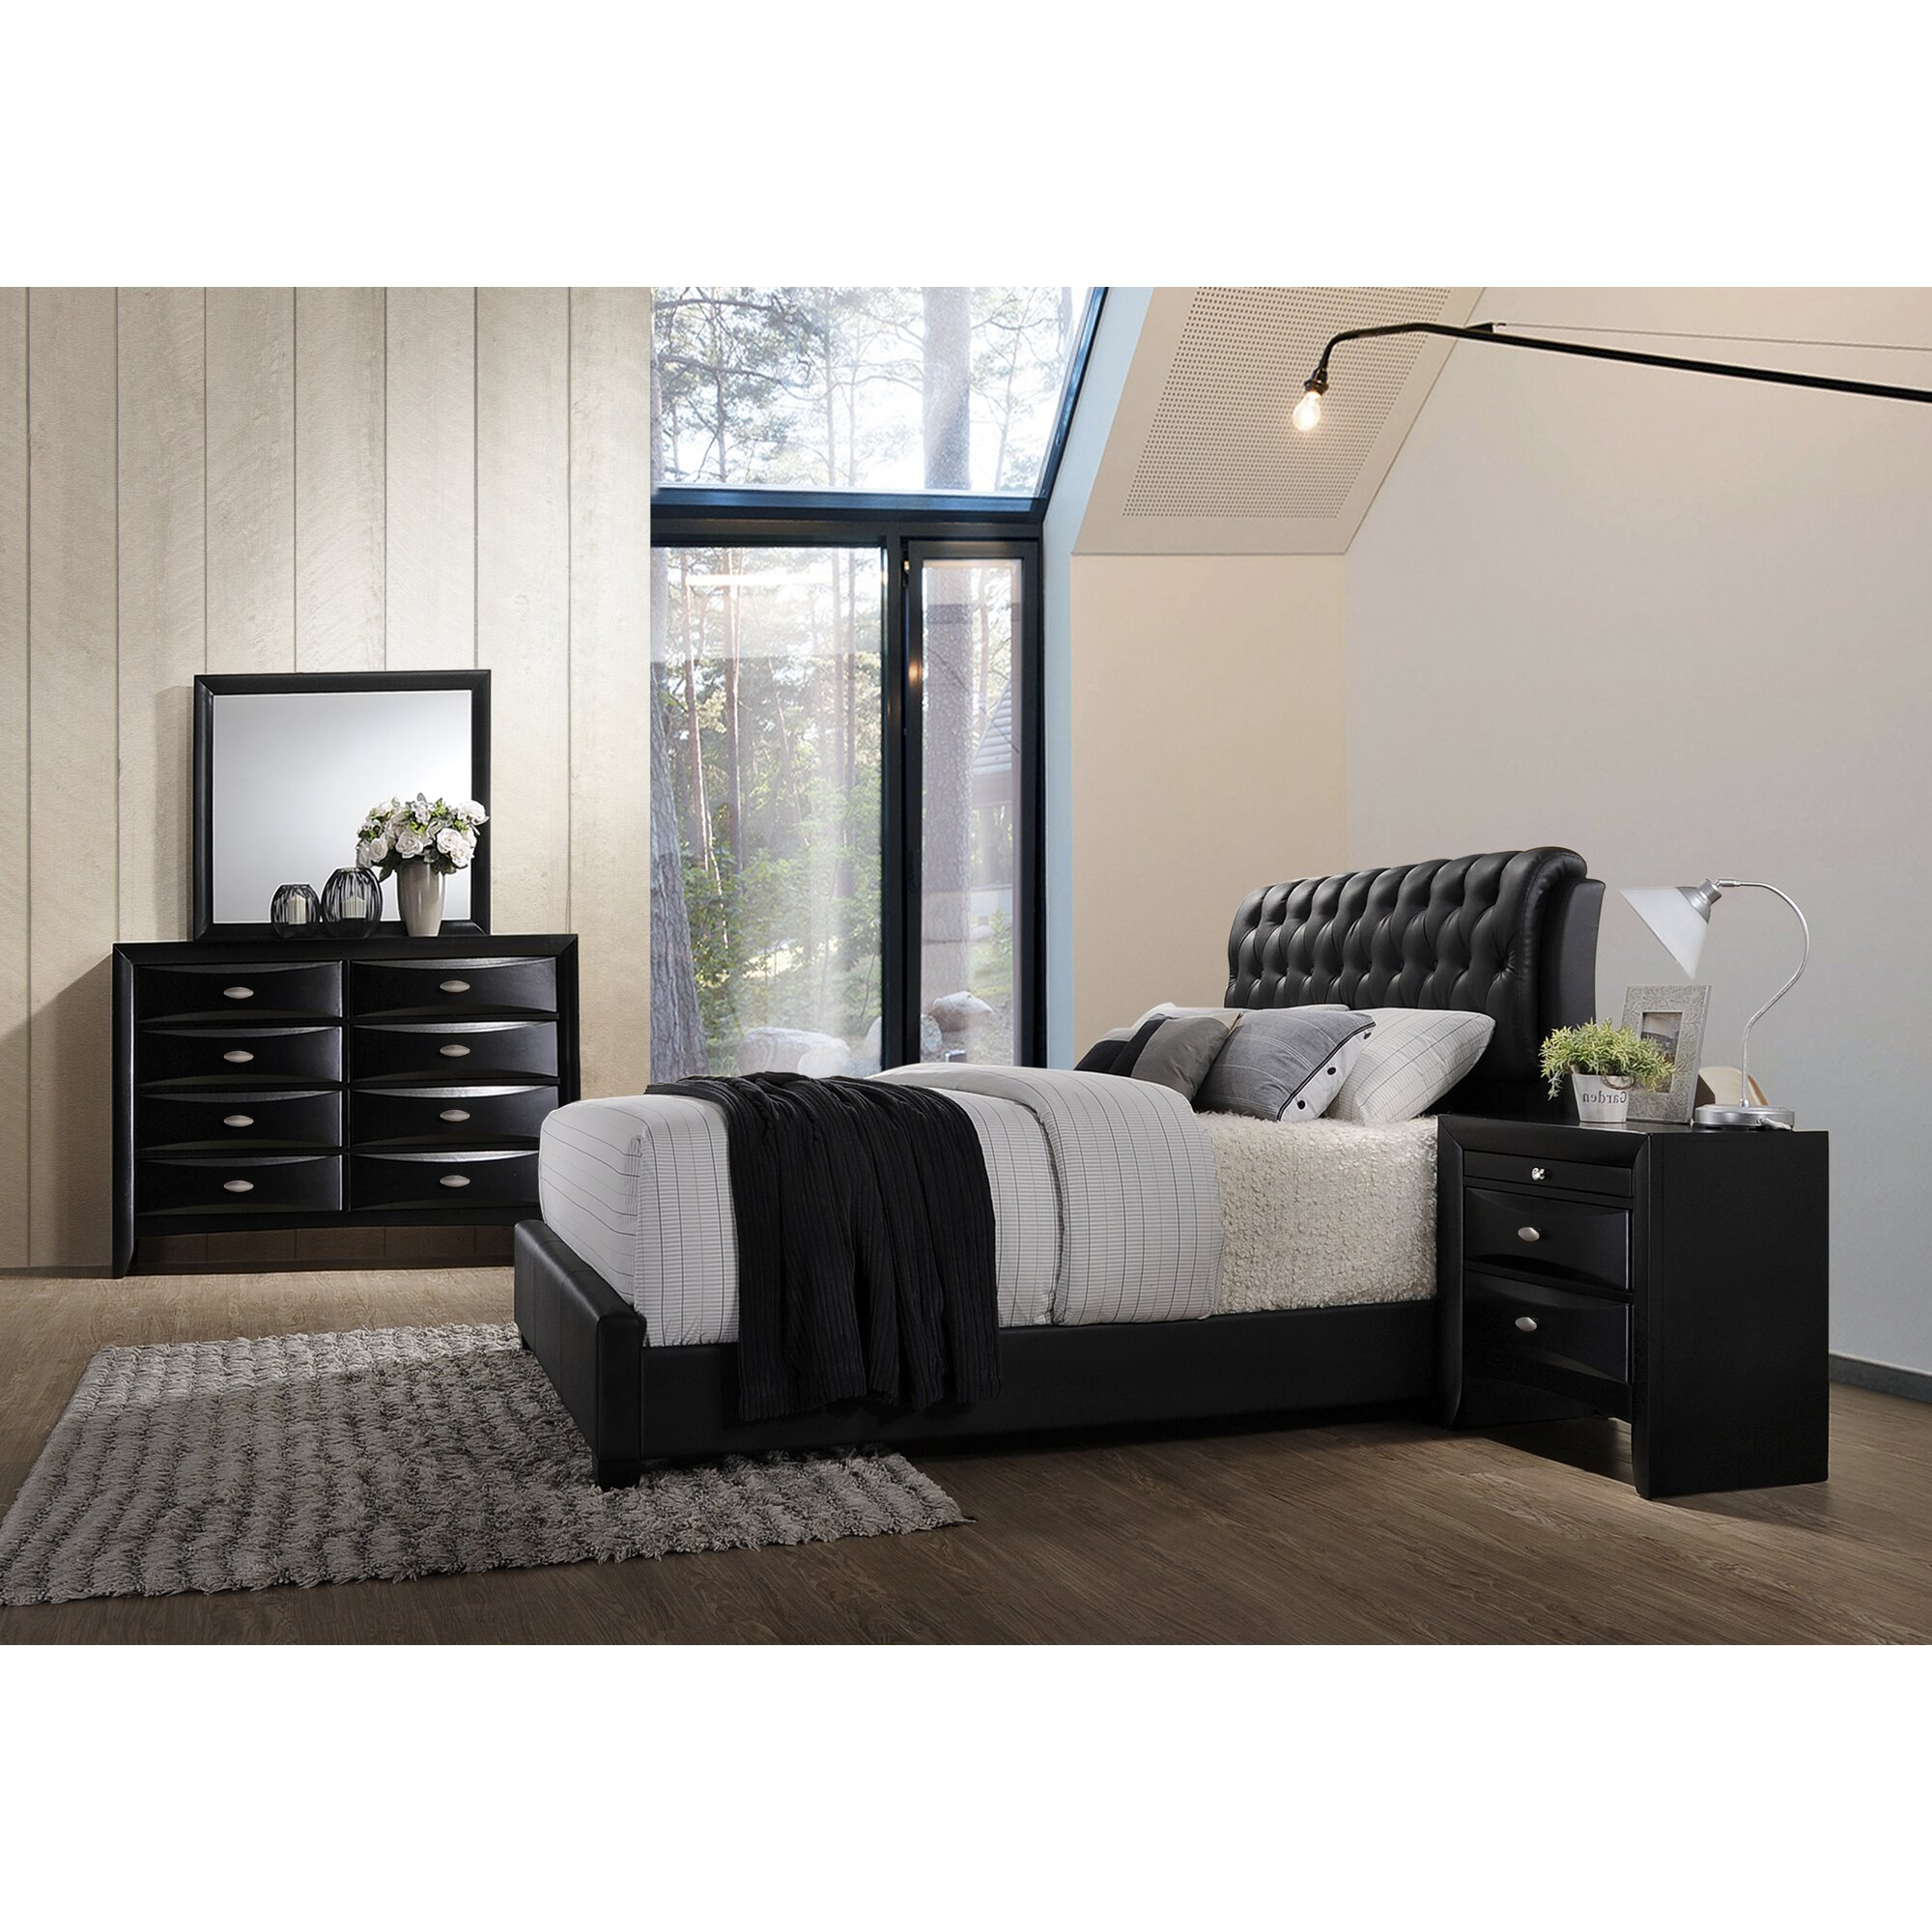 Roundhill Furniture Blemerey 4 Piece Bedroom Set